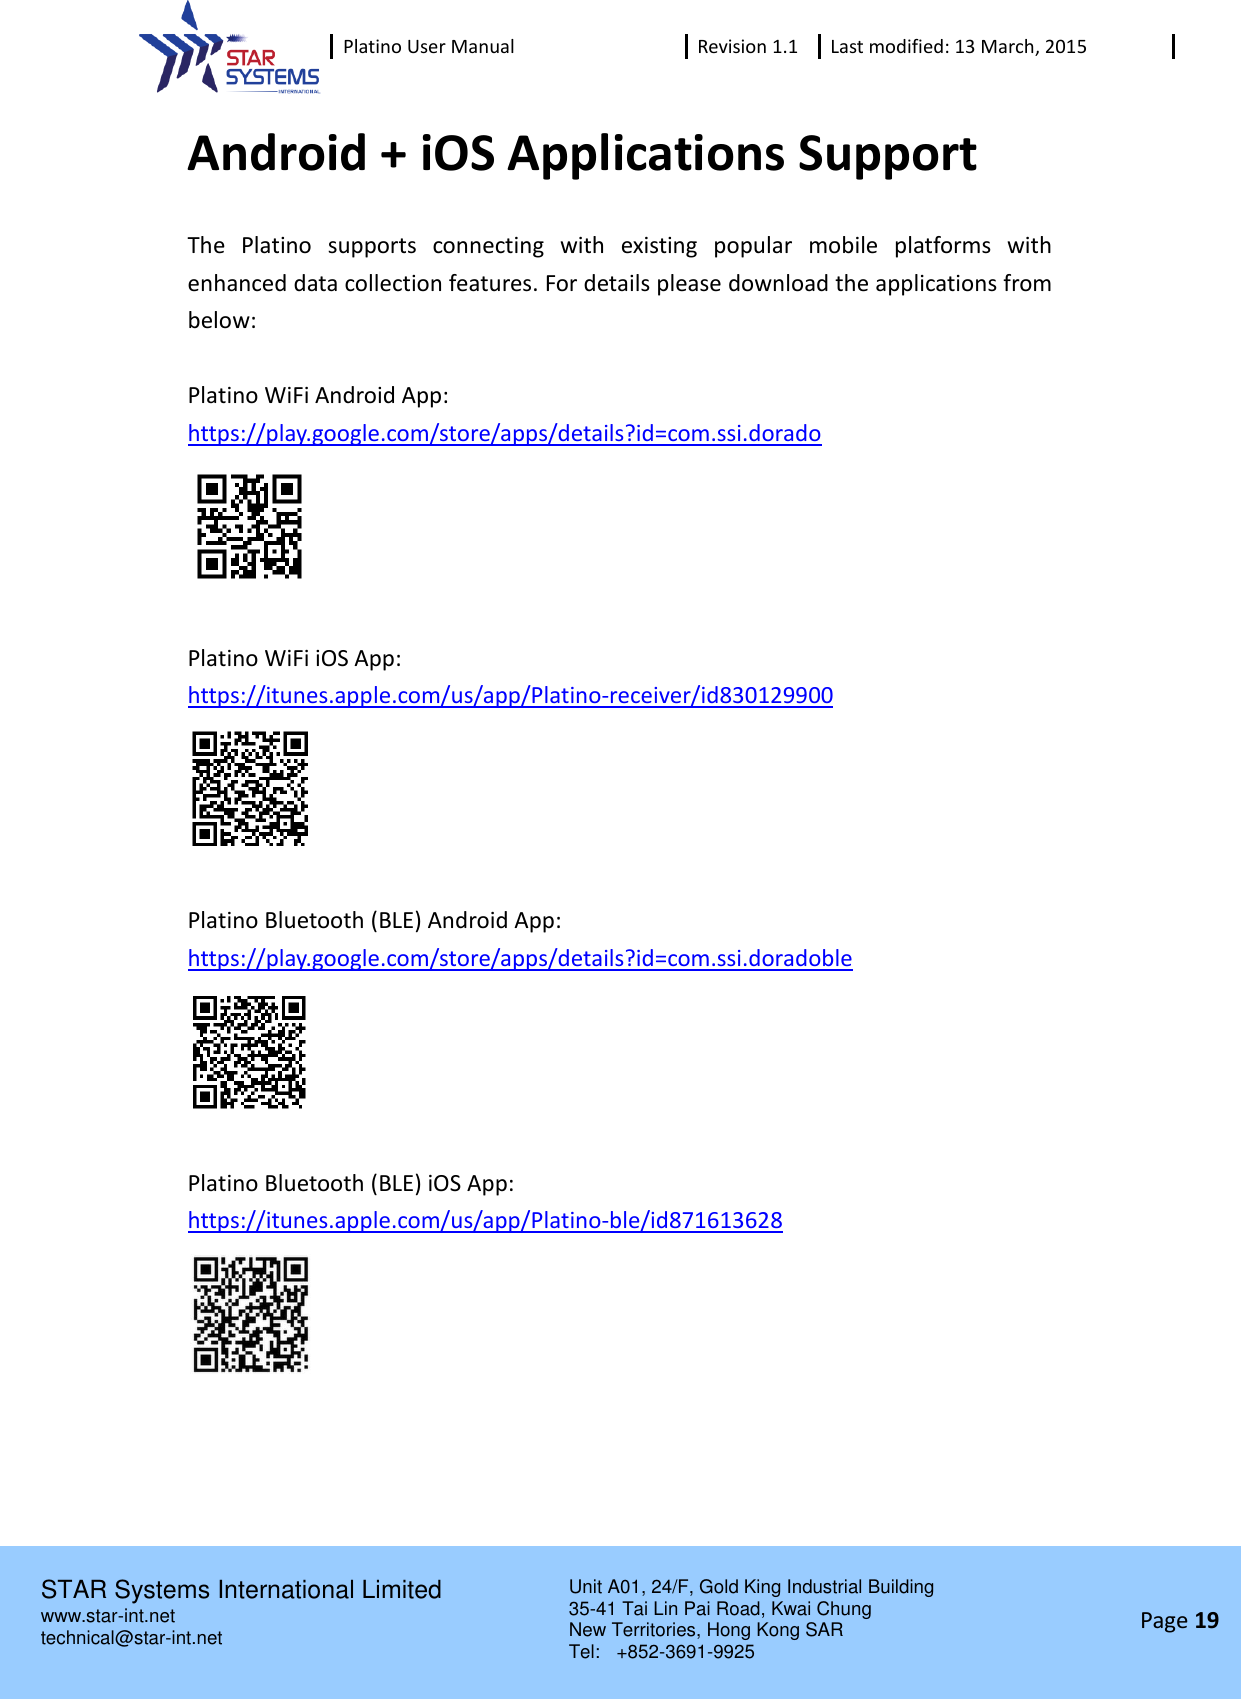 Star Systems PLATINO-WF2014 RFID Handheld Reader User Manual